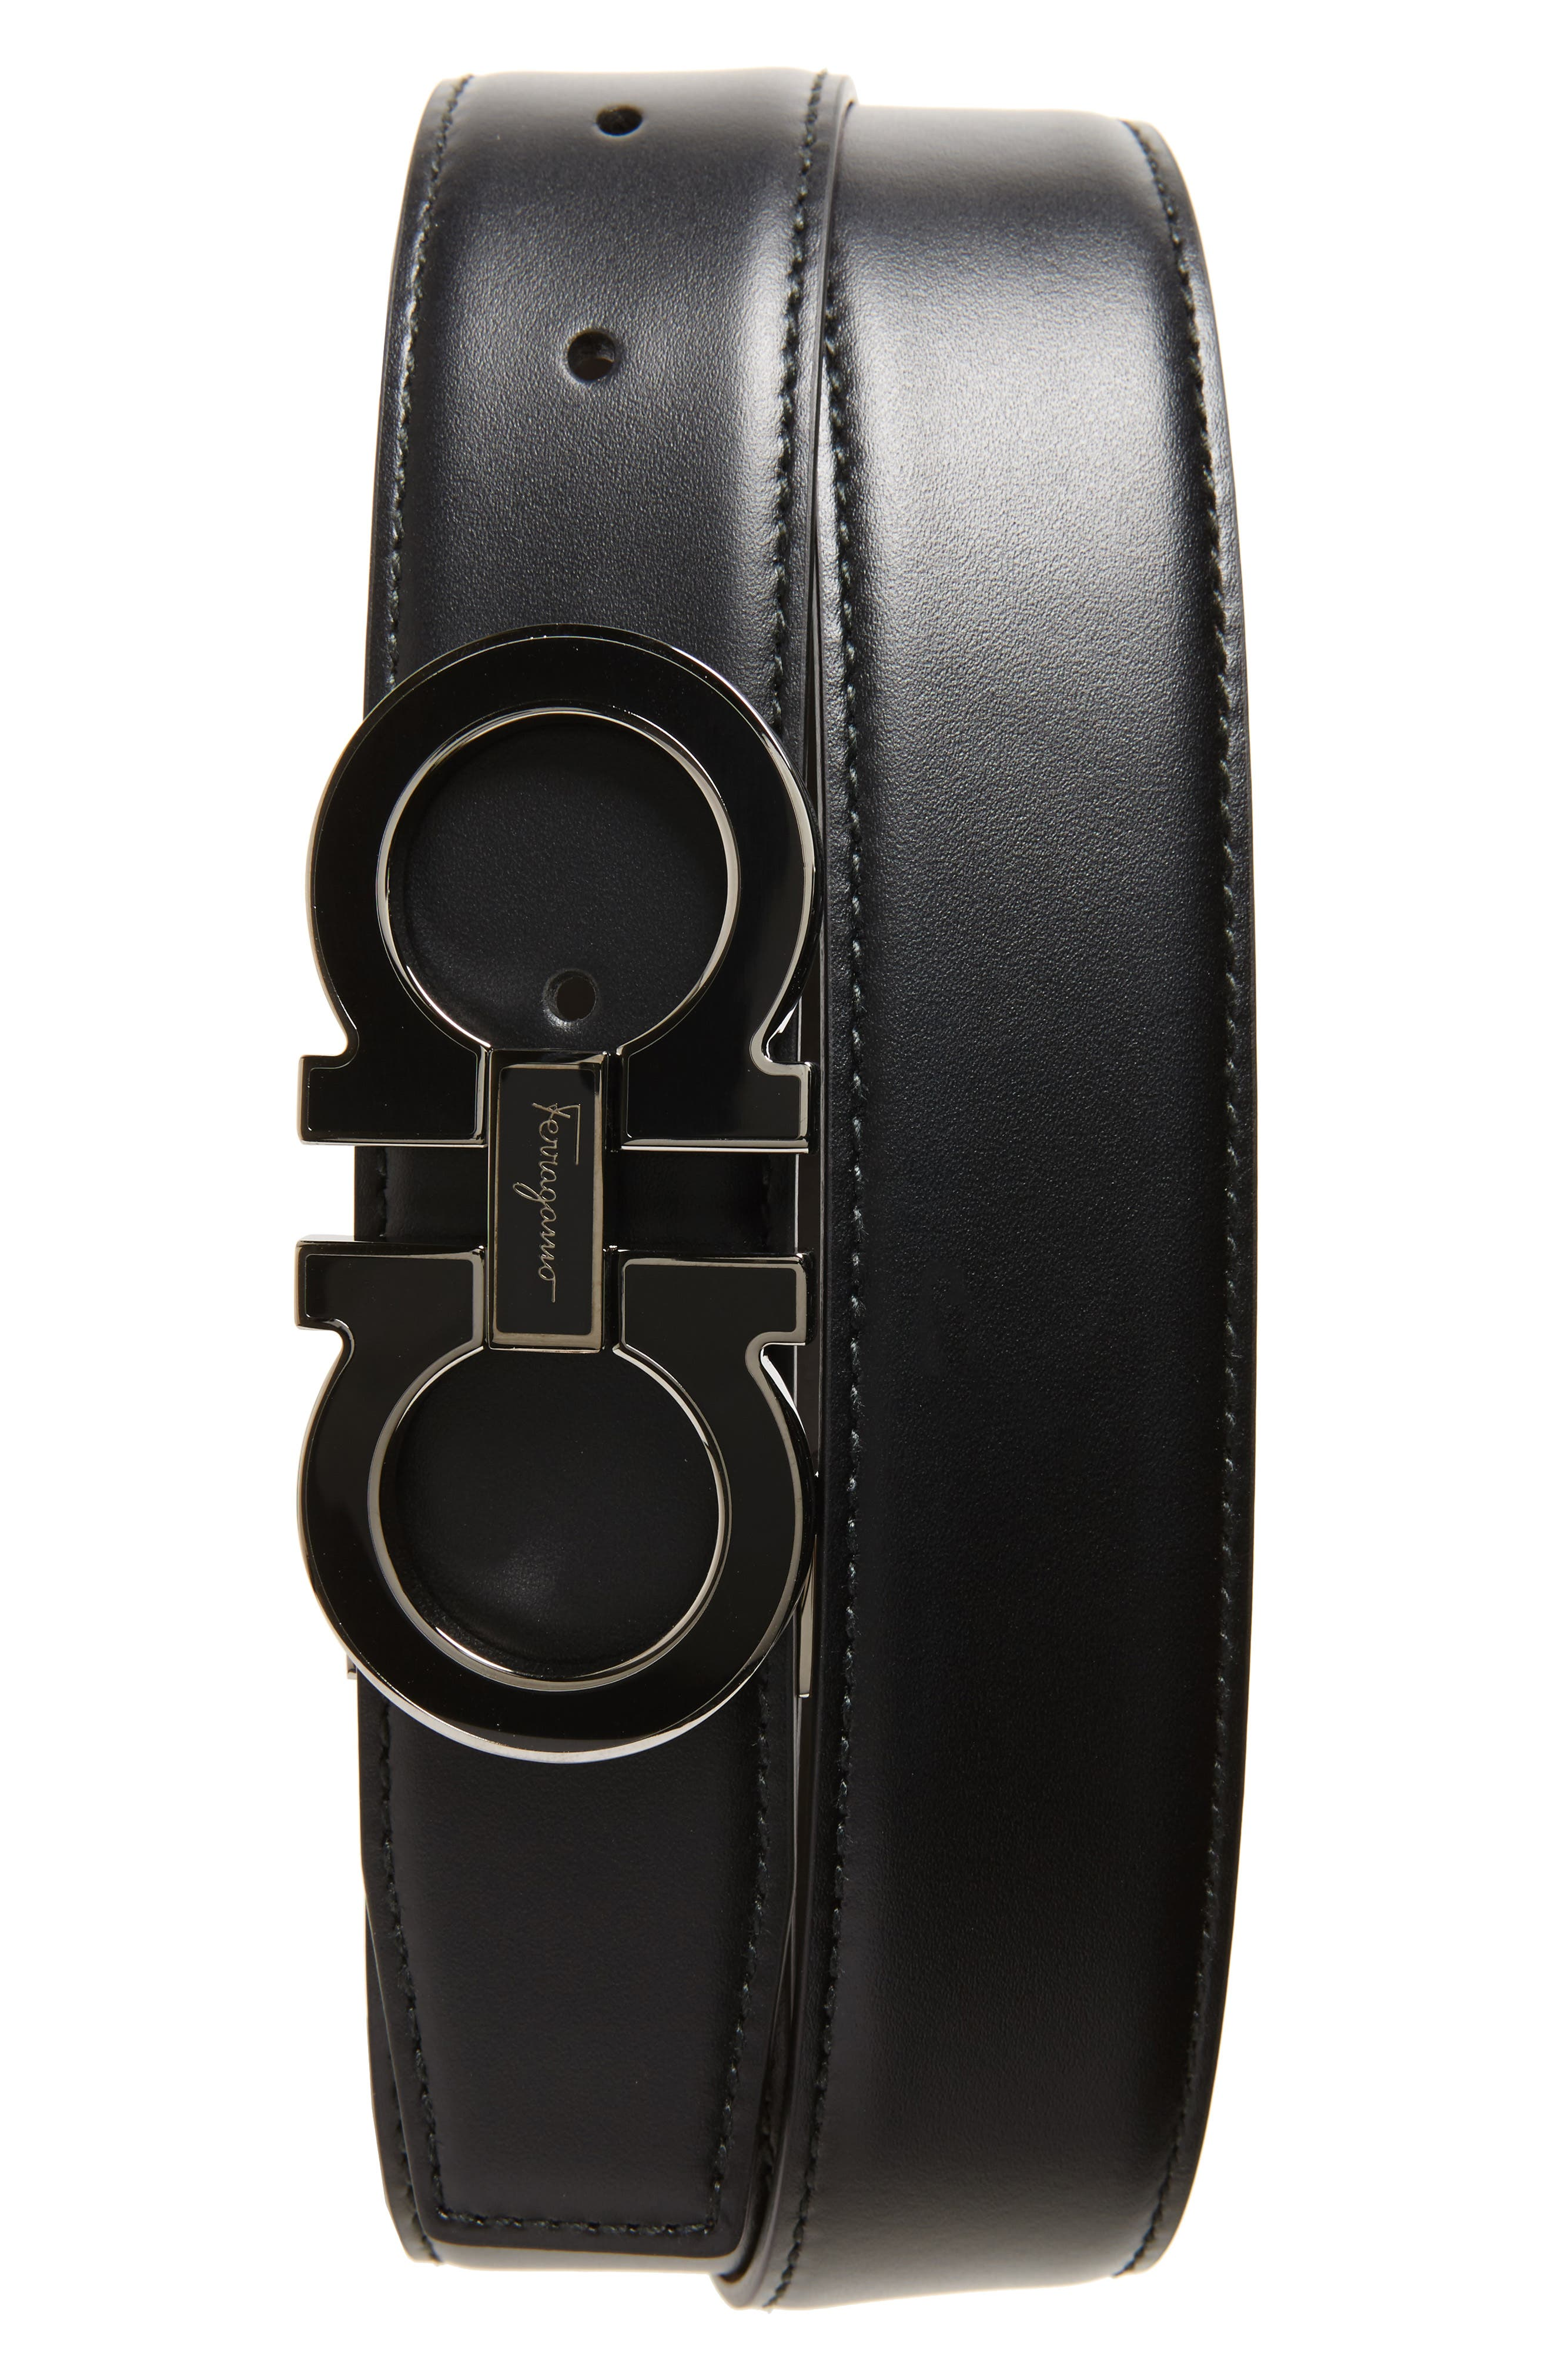 SALVATORE FERRAGAMO, Double Gancio Leather Belt, Main thumbnail 1, color, BLACK